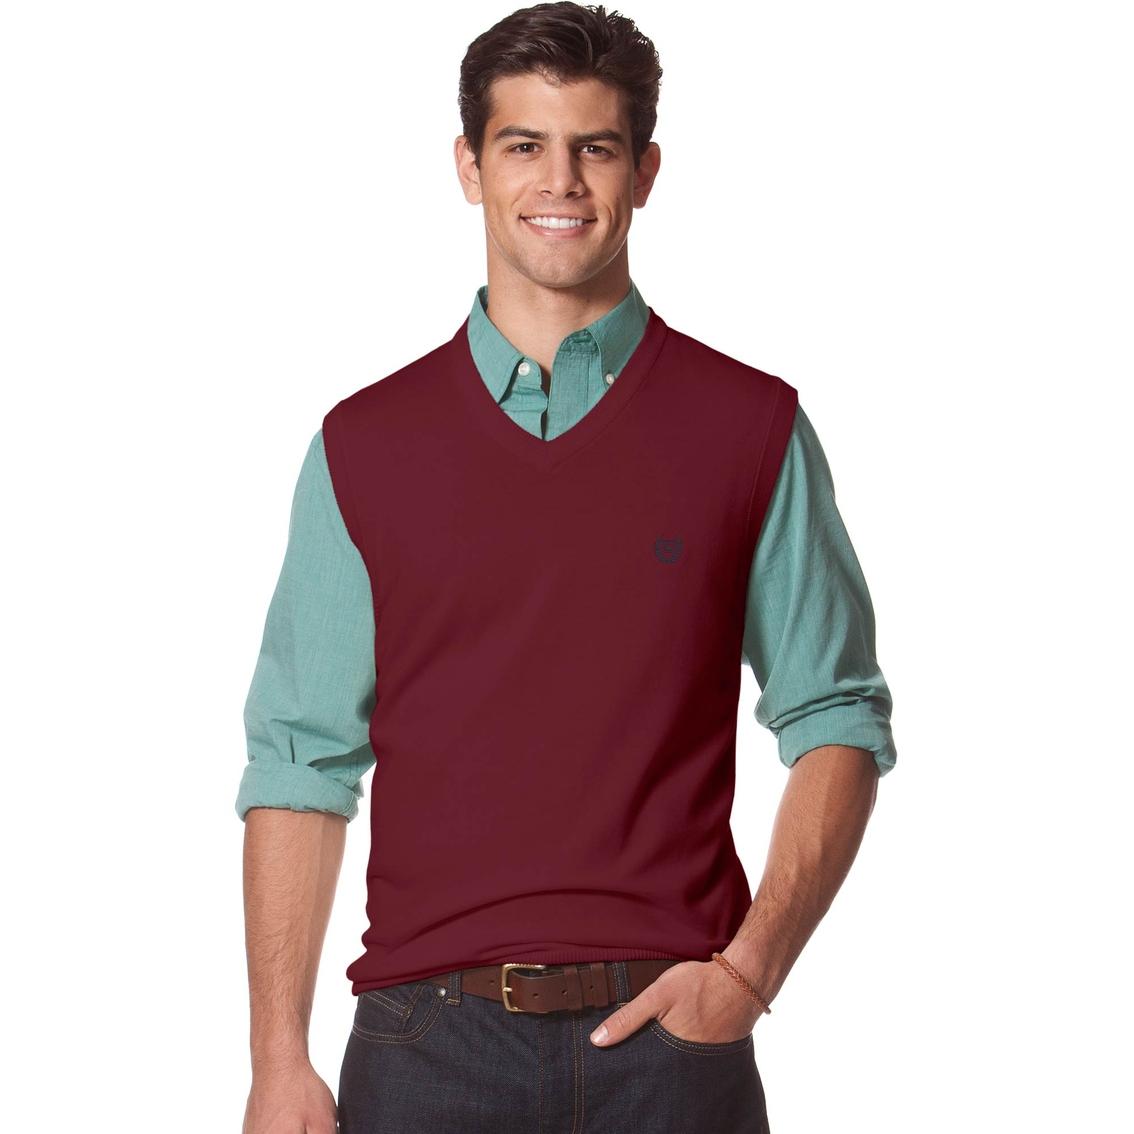 Chaps Combed Cotton Sweater Vest | Men's | Clearance | Shop The ...